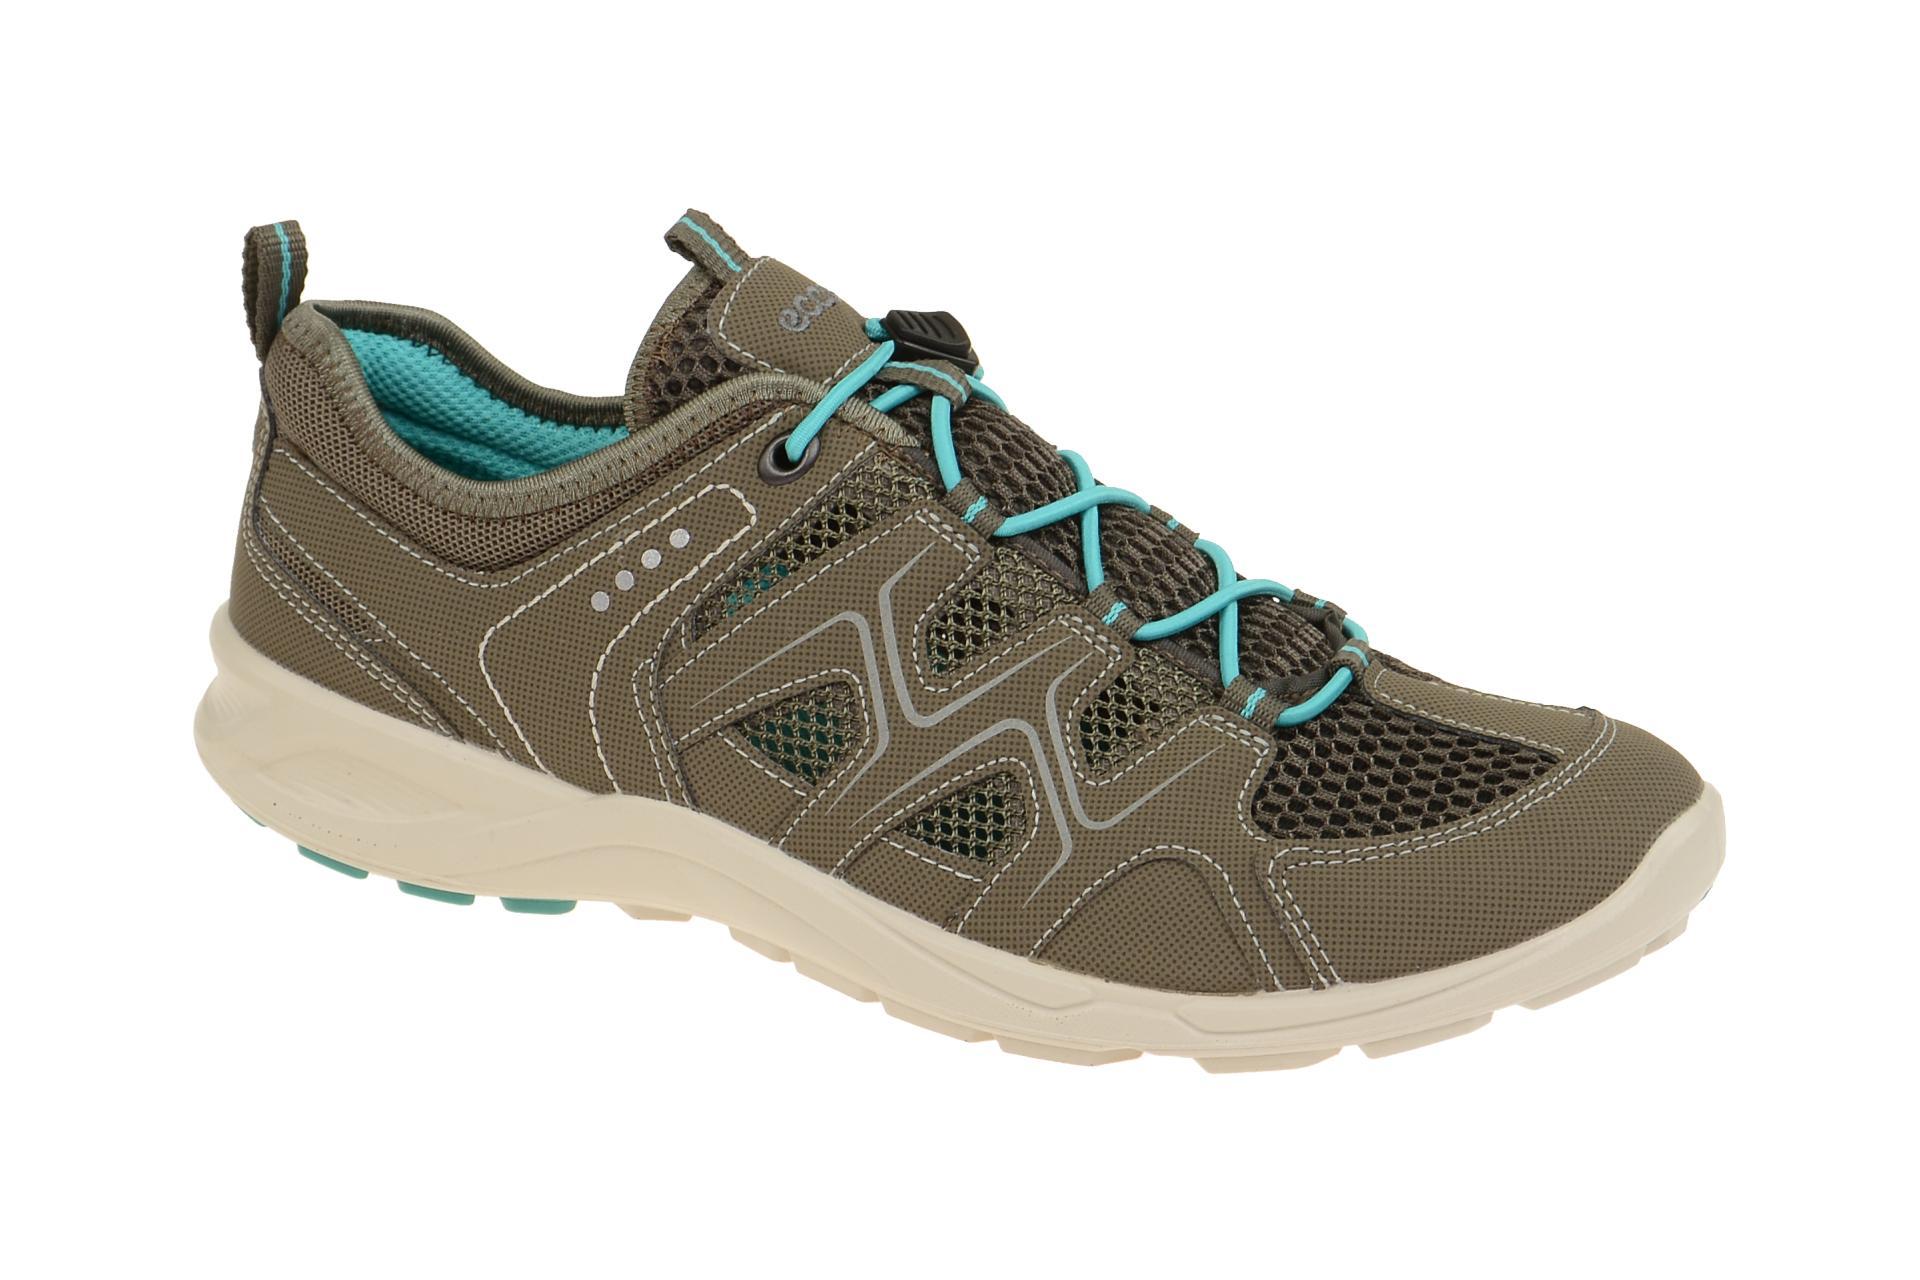 f325db5f717483 Ecco TerraCruise Schuhe schwarz Damen Sneaker Billig Großhandelspreis  HOOboLPoPV